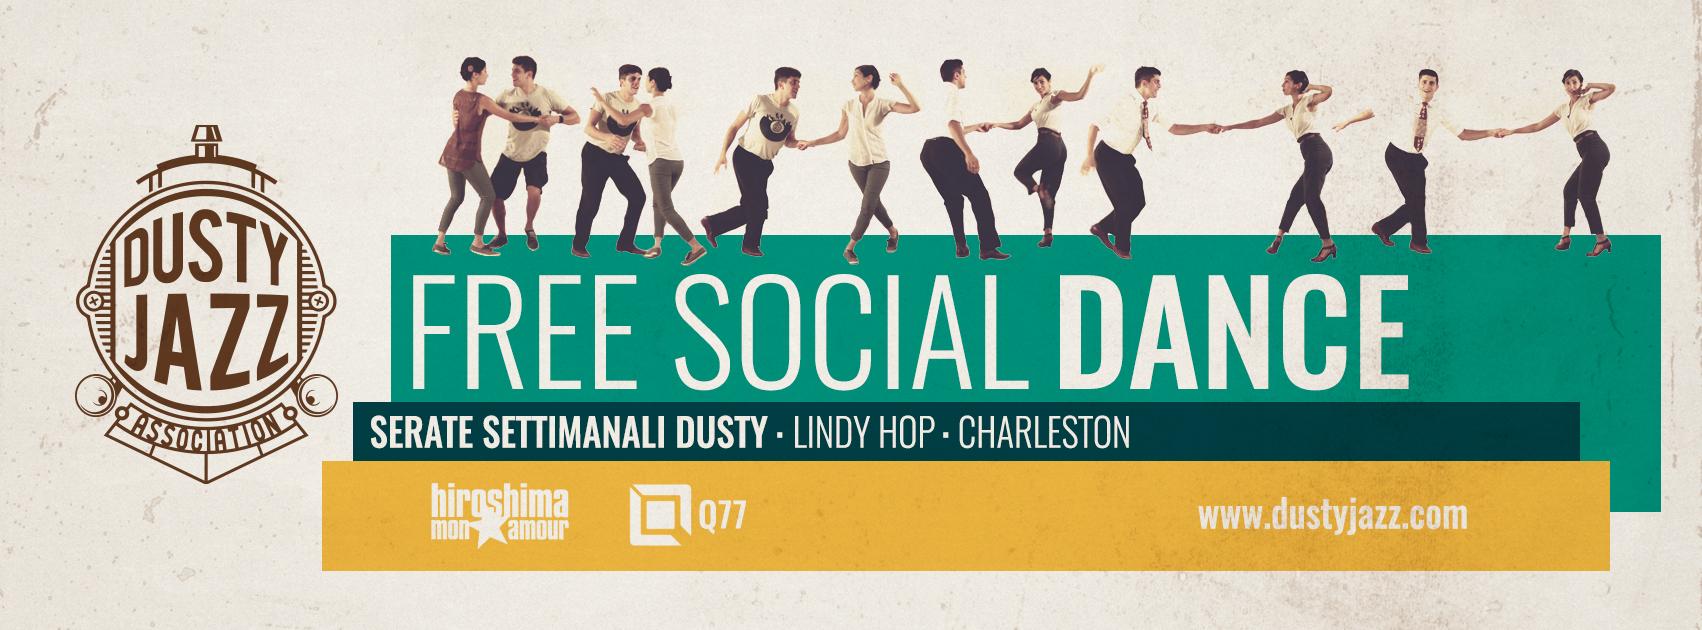 copertina-free-social-dance-dusty-jazz